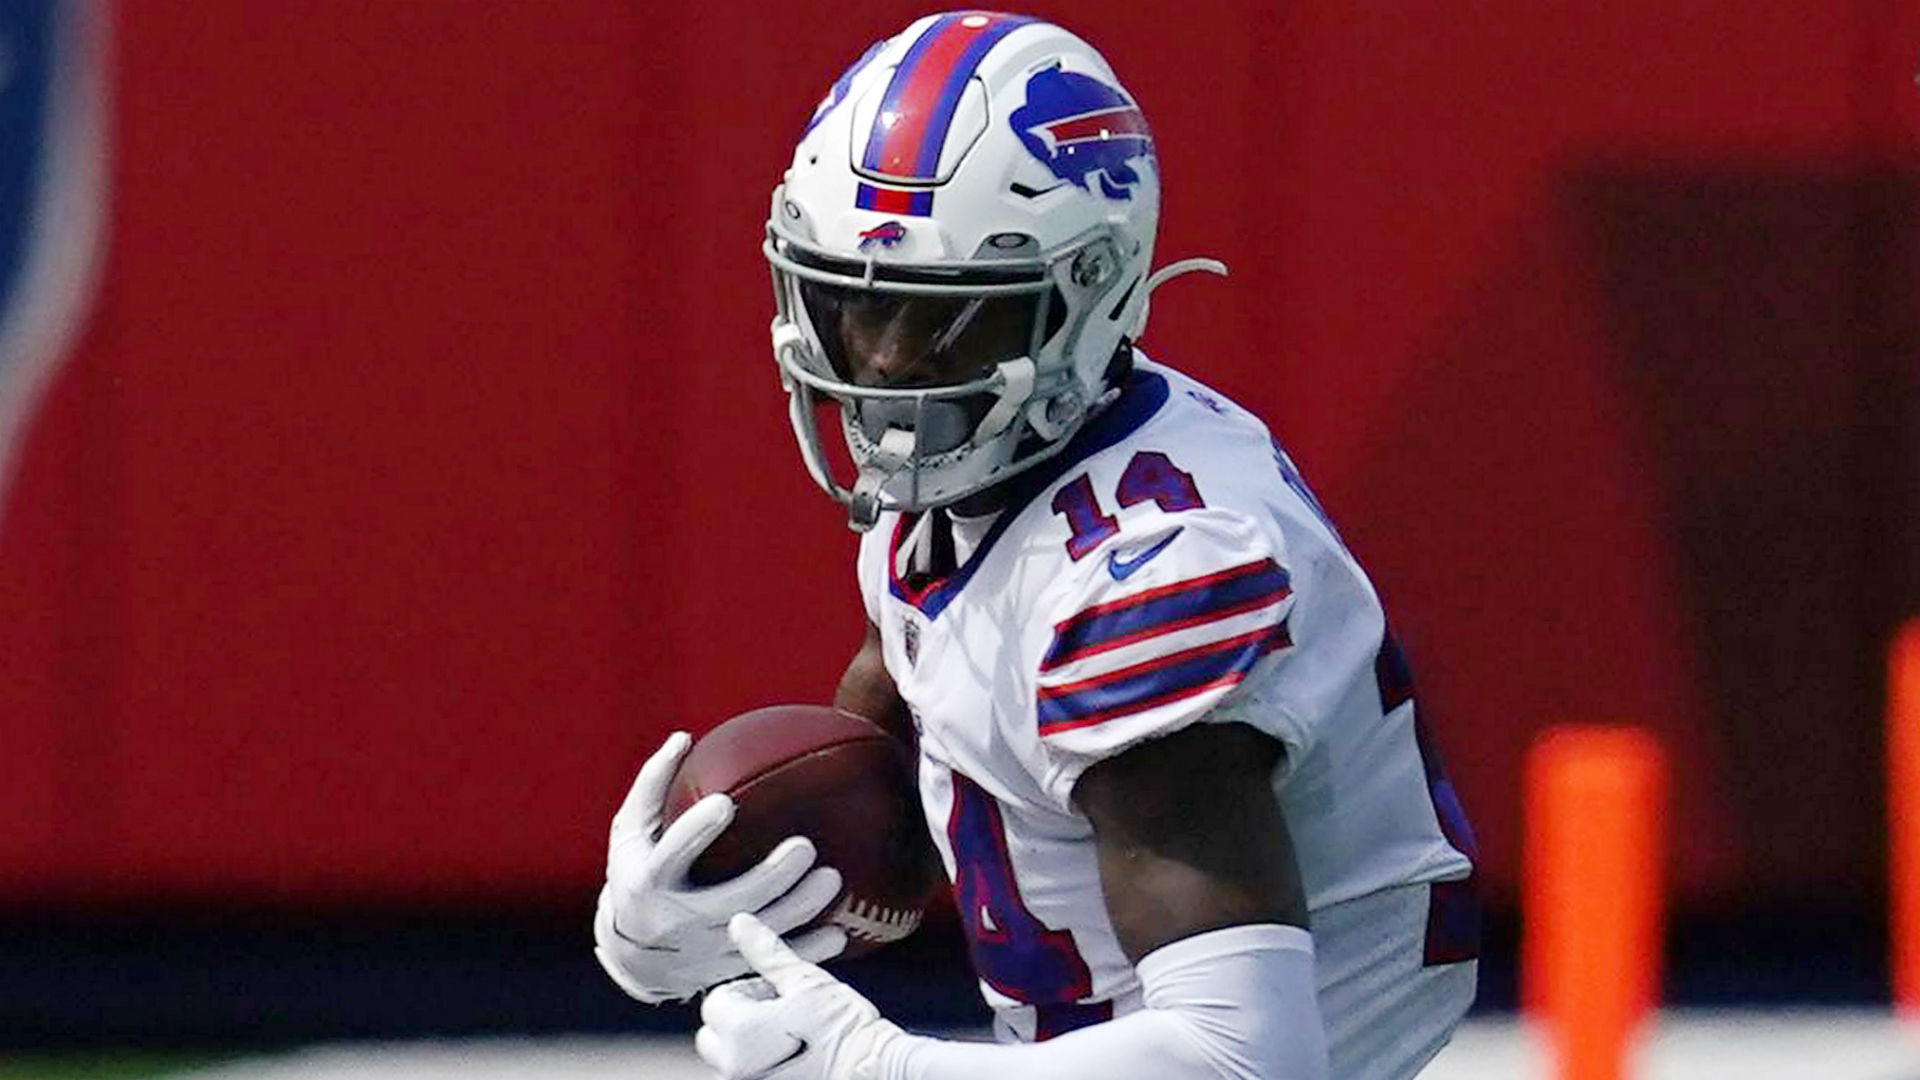 Bills' Stefon Diggs played through insane injury during the 2021 NFL playoffs